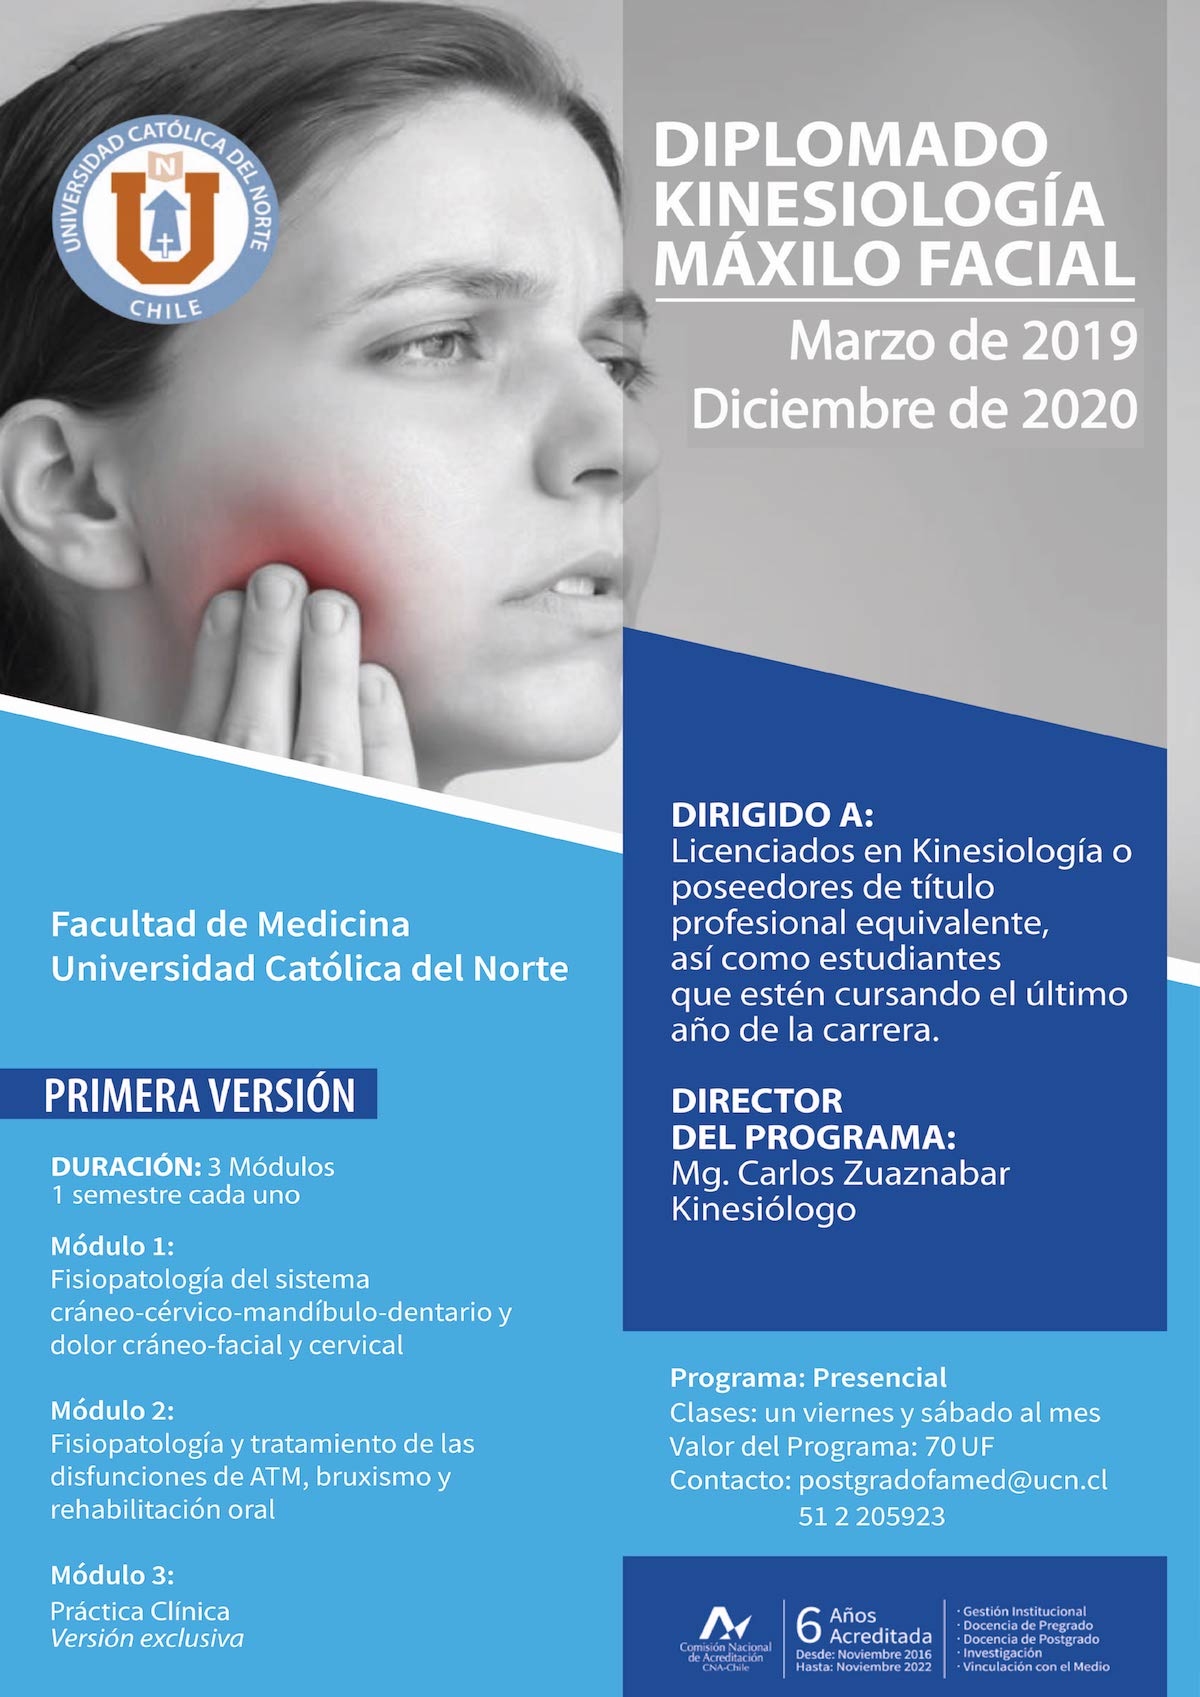 Diplomado en Kinesiologia Maxilo Facial - Facultad de Medicina - UCN